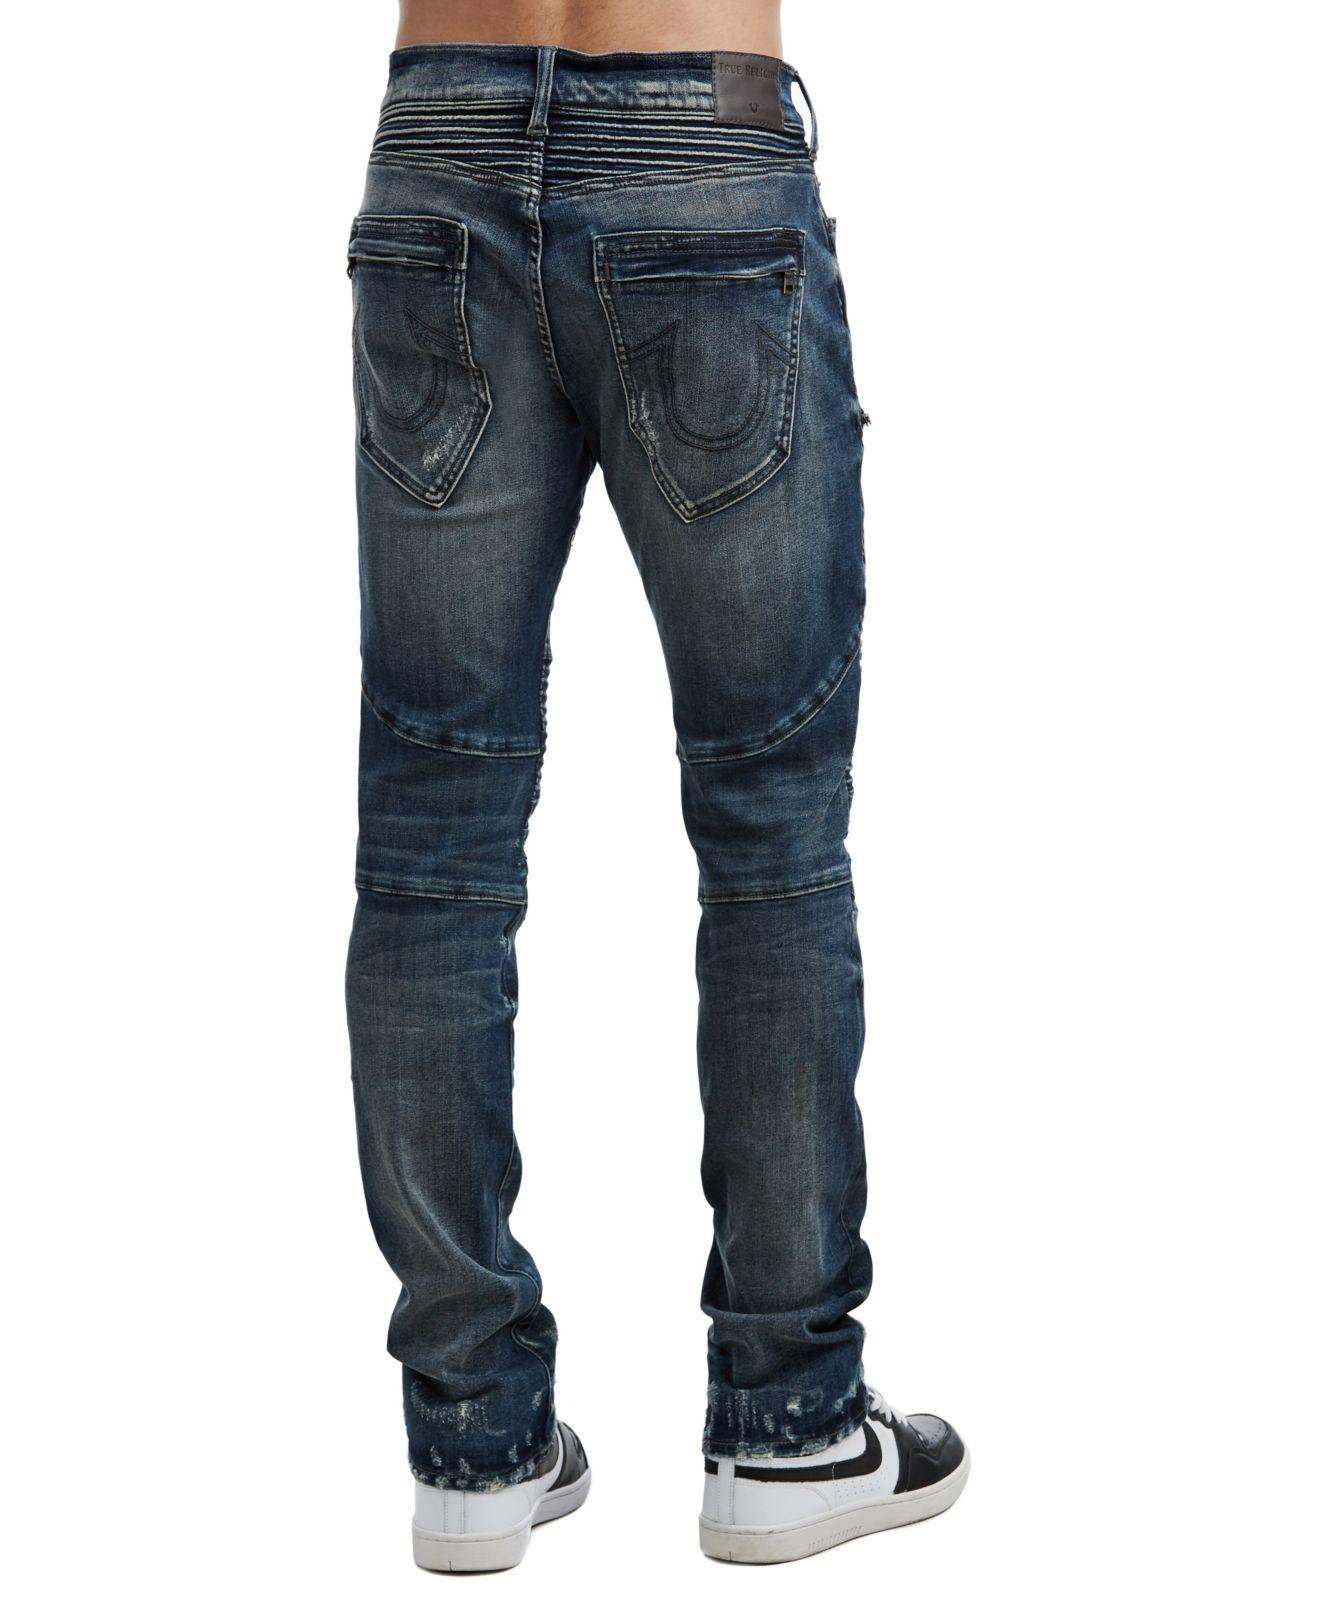 38097997 True Religion Rocco Classic Moto Jeans in Blue for Men - Lyst